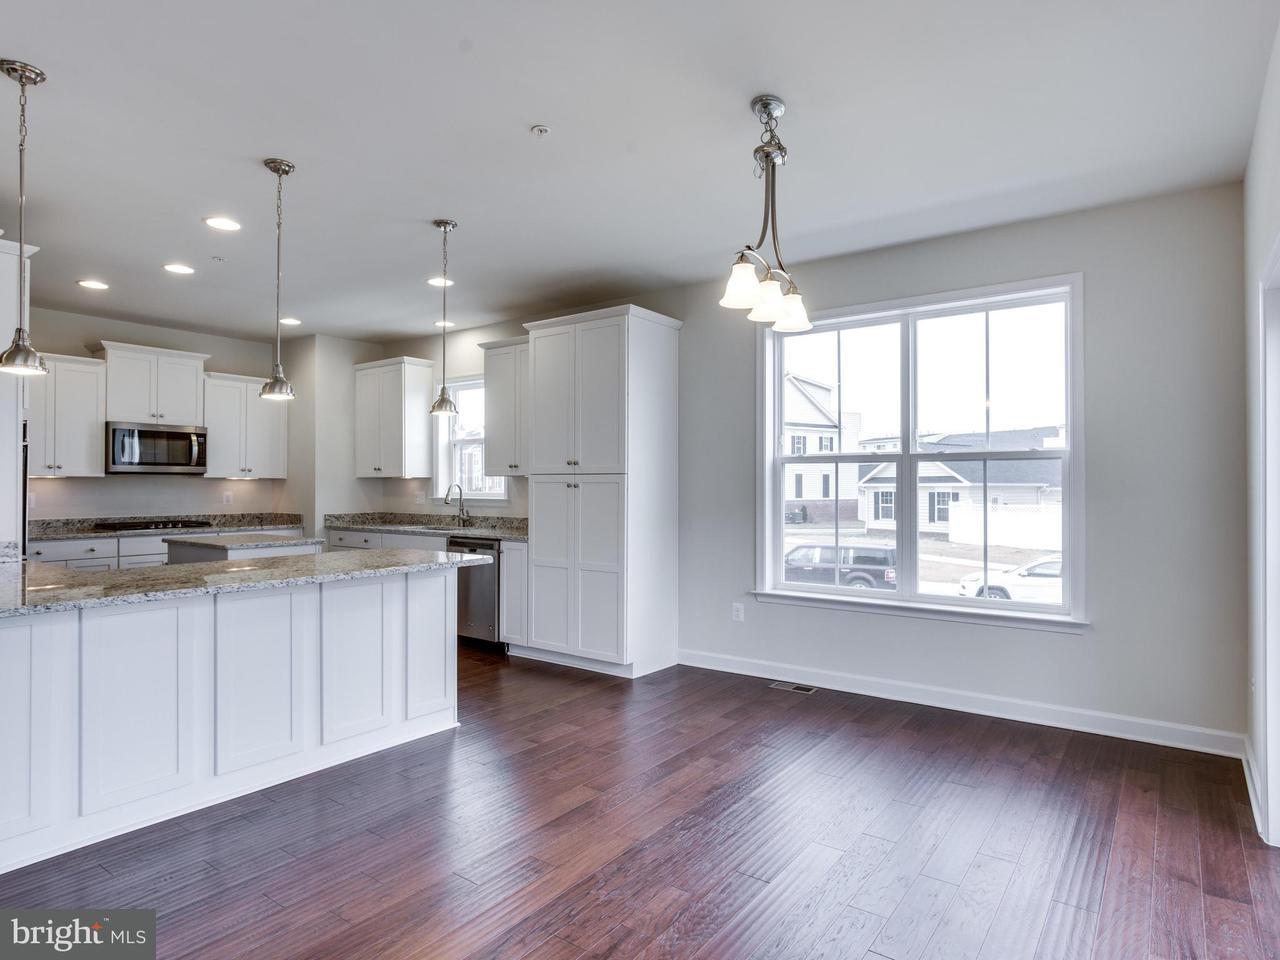 Single Family Home for Sale at 10918 Louis Detrick Lane 10918 Louis Detrick Lane Monrovia, Maryland 21770 United States